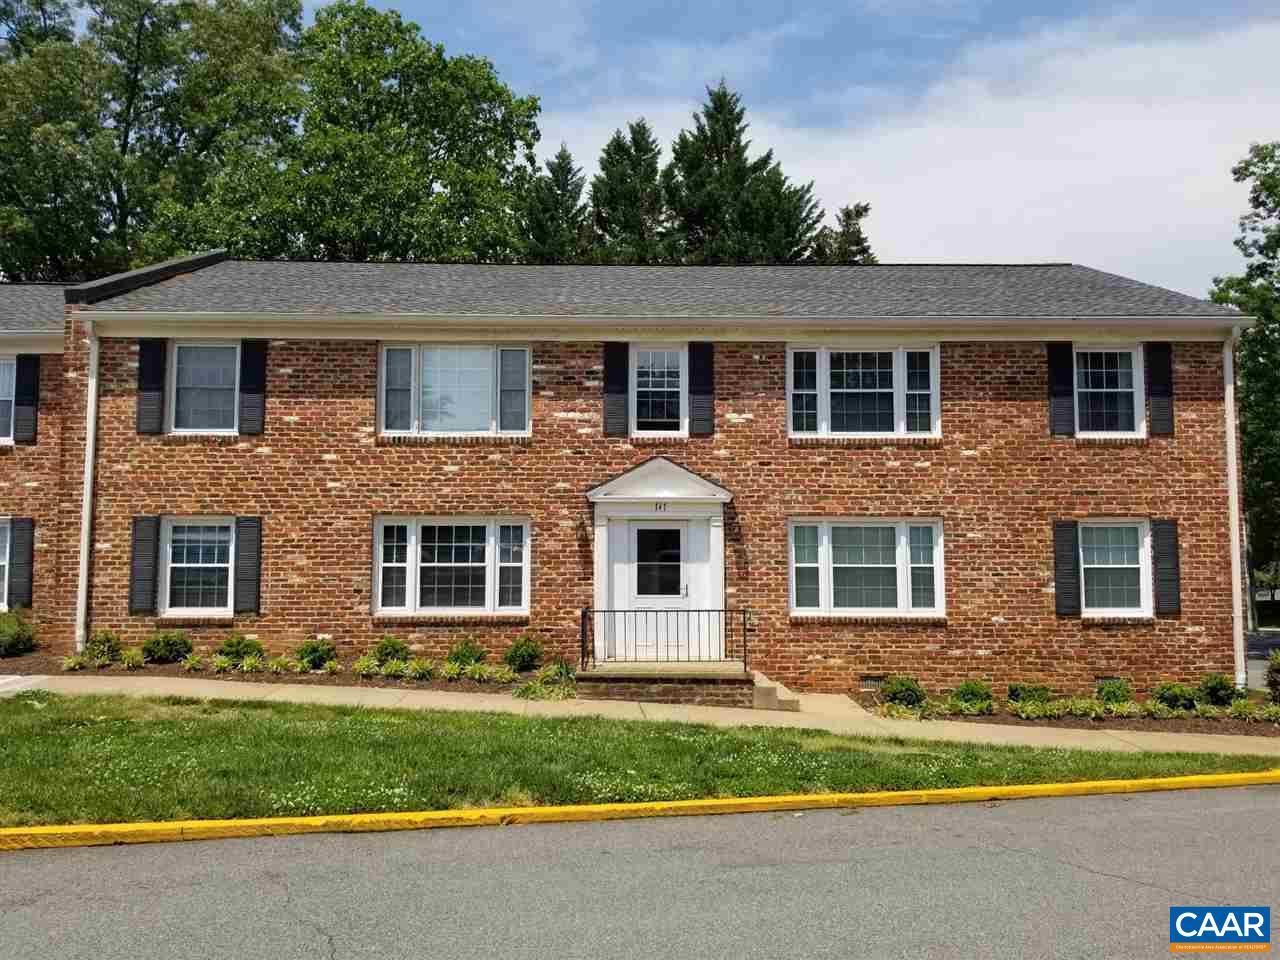 home for sale , MLS #576462, 141 Hessian Hills Cir